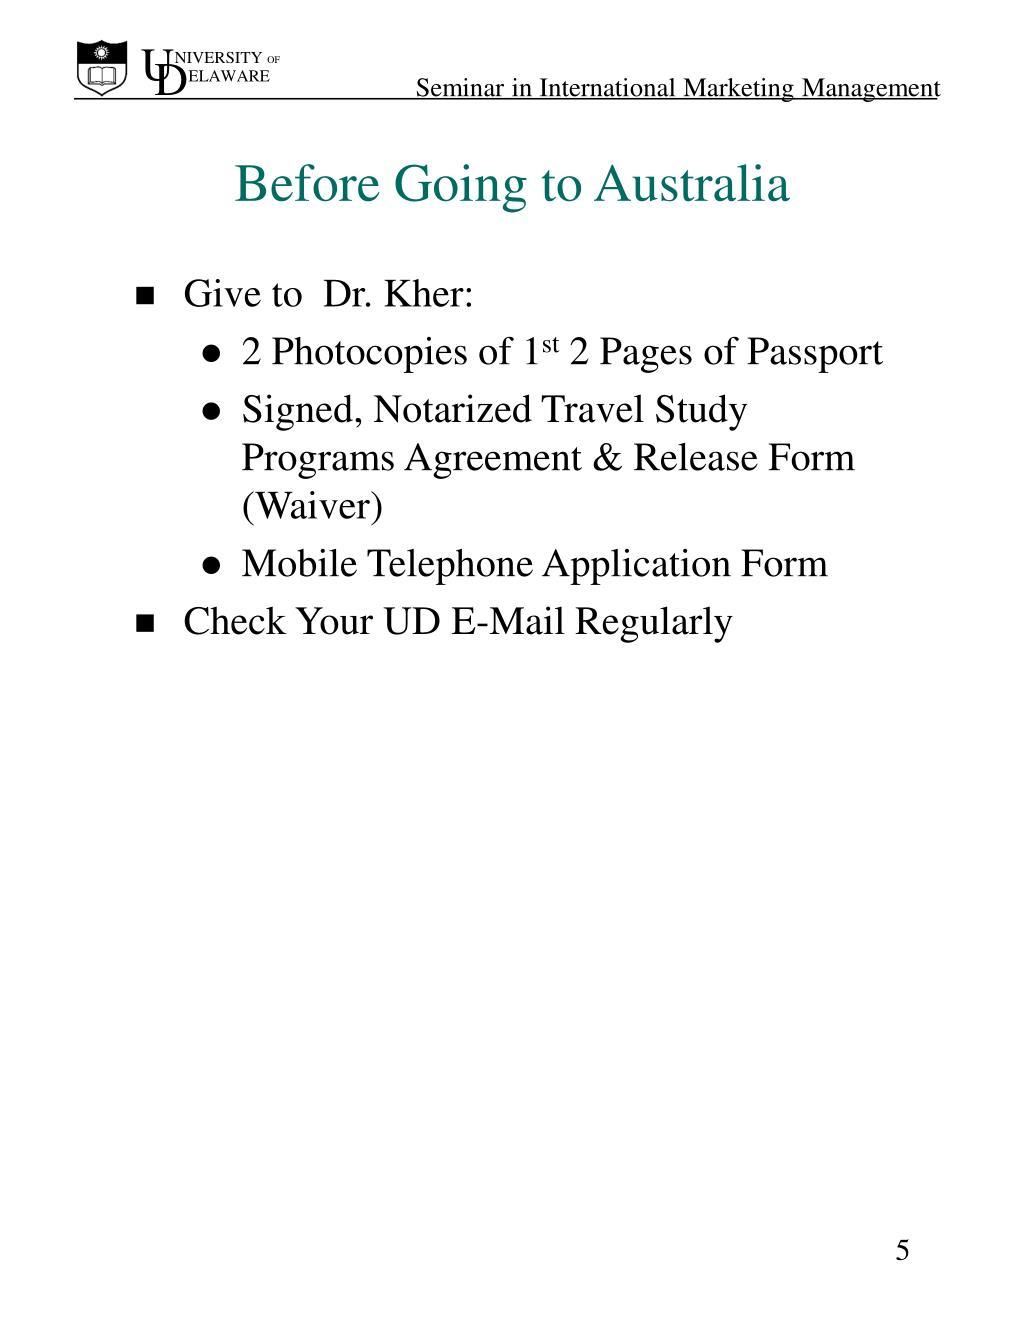 Before Going to Australia